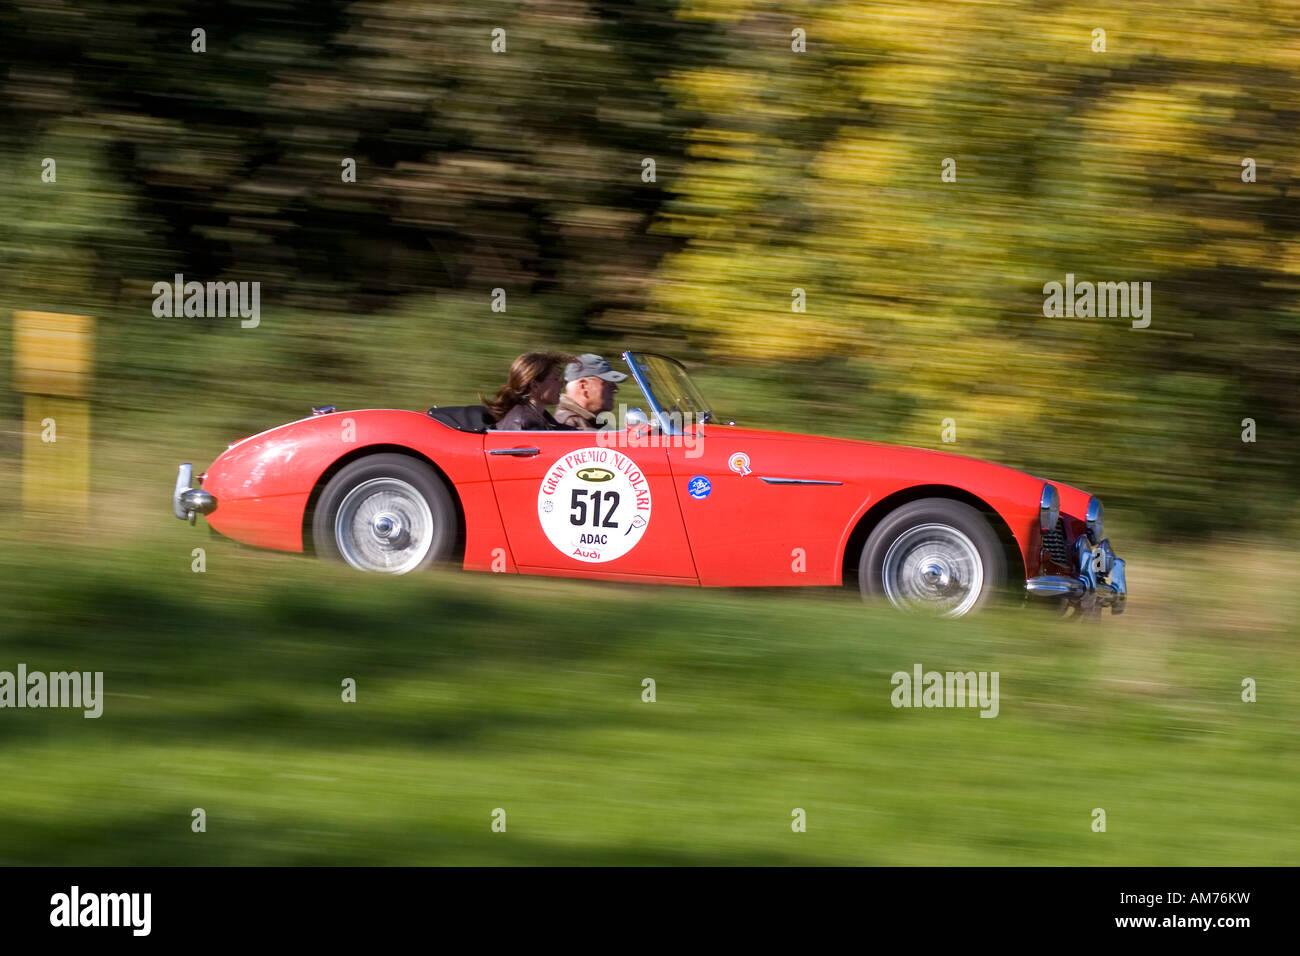 Austin Healey 3000 MK I, Baujahr 1959, Nürburgring Classic 2007 Stockbild